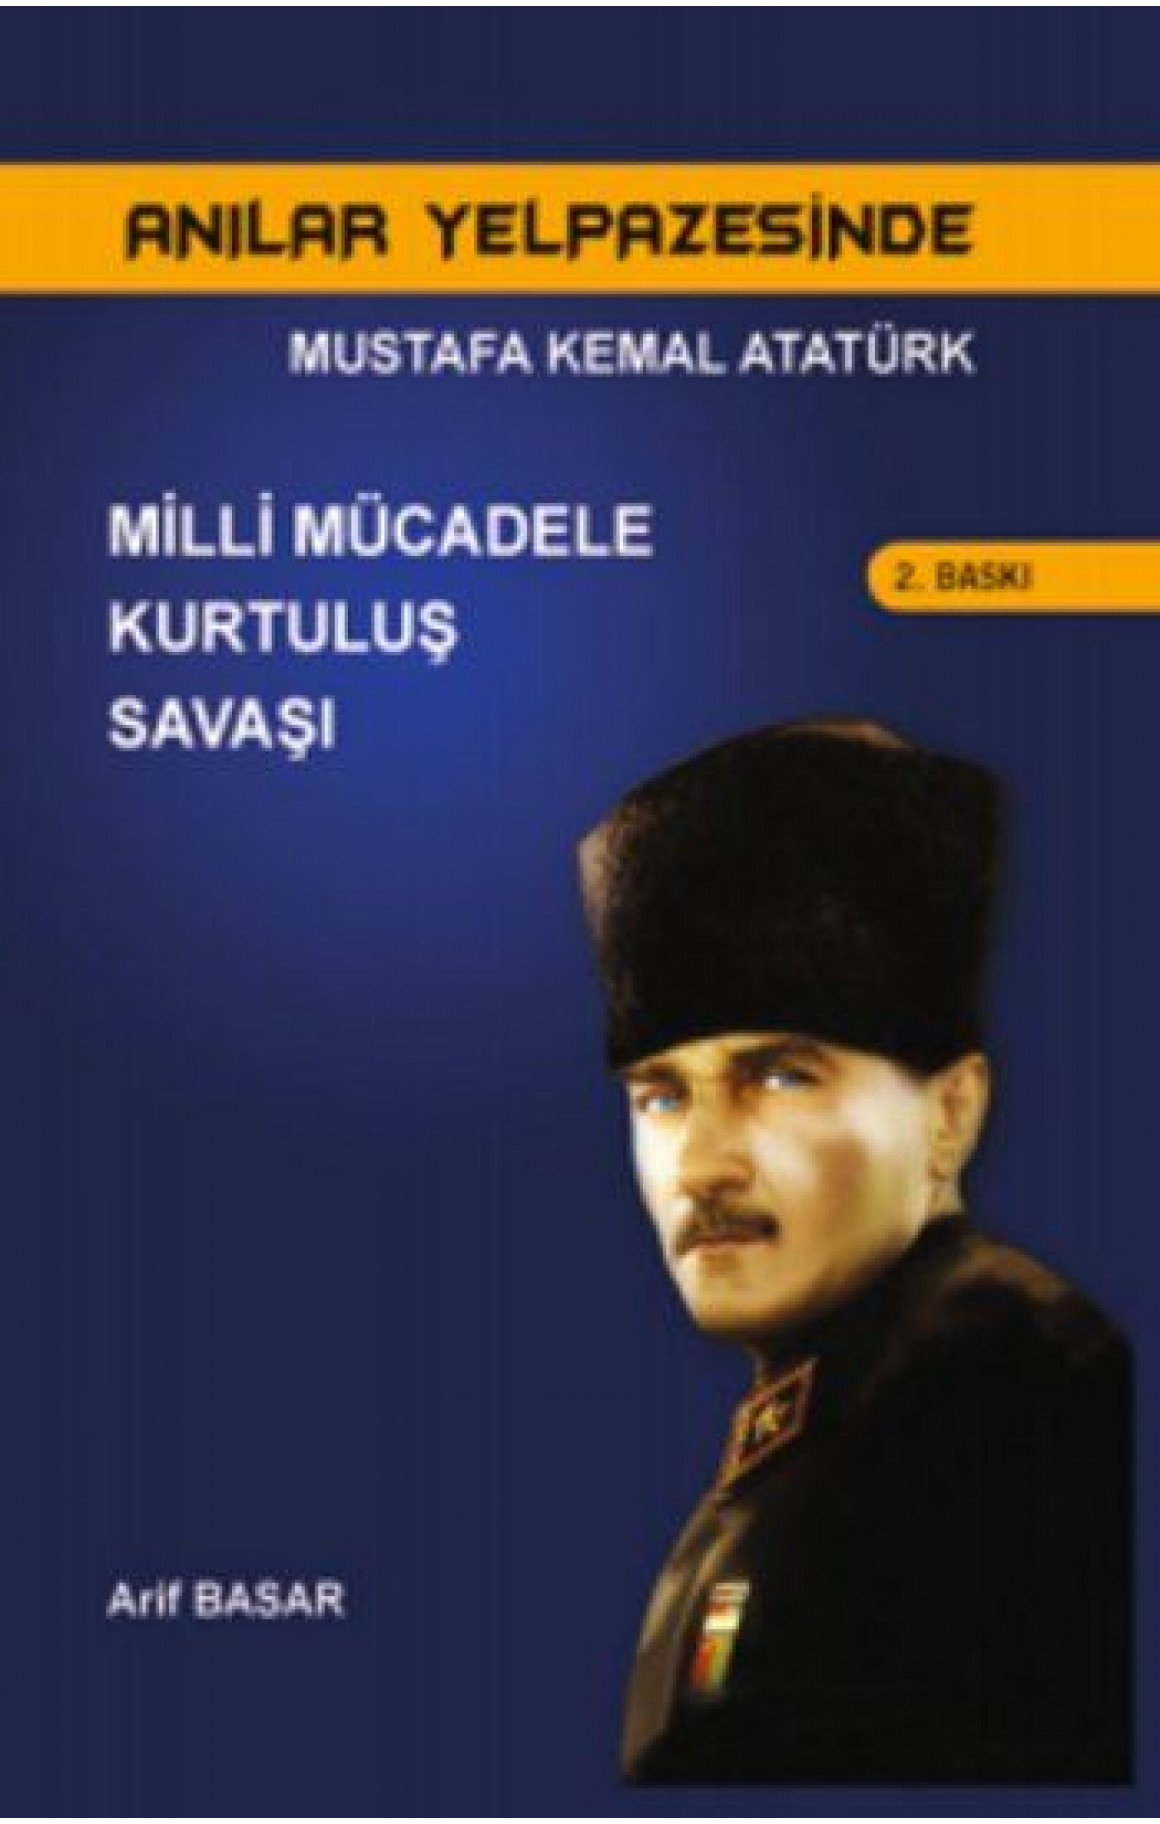 Mustafa Kemal Atatürk Milli Mücadele Kurtuluş Savaşı